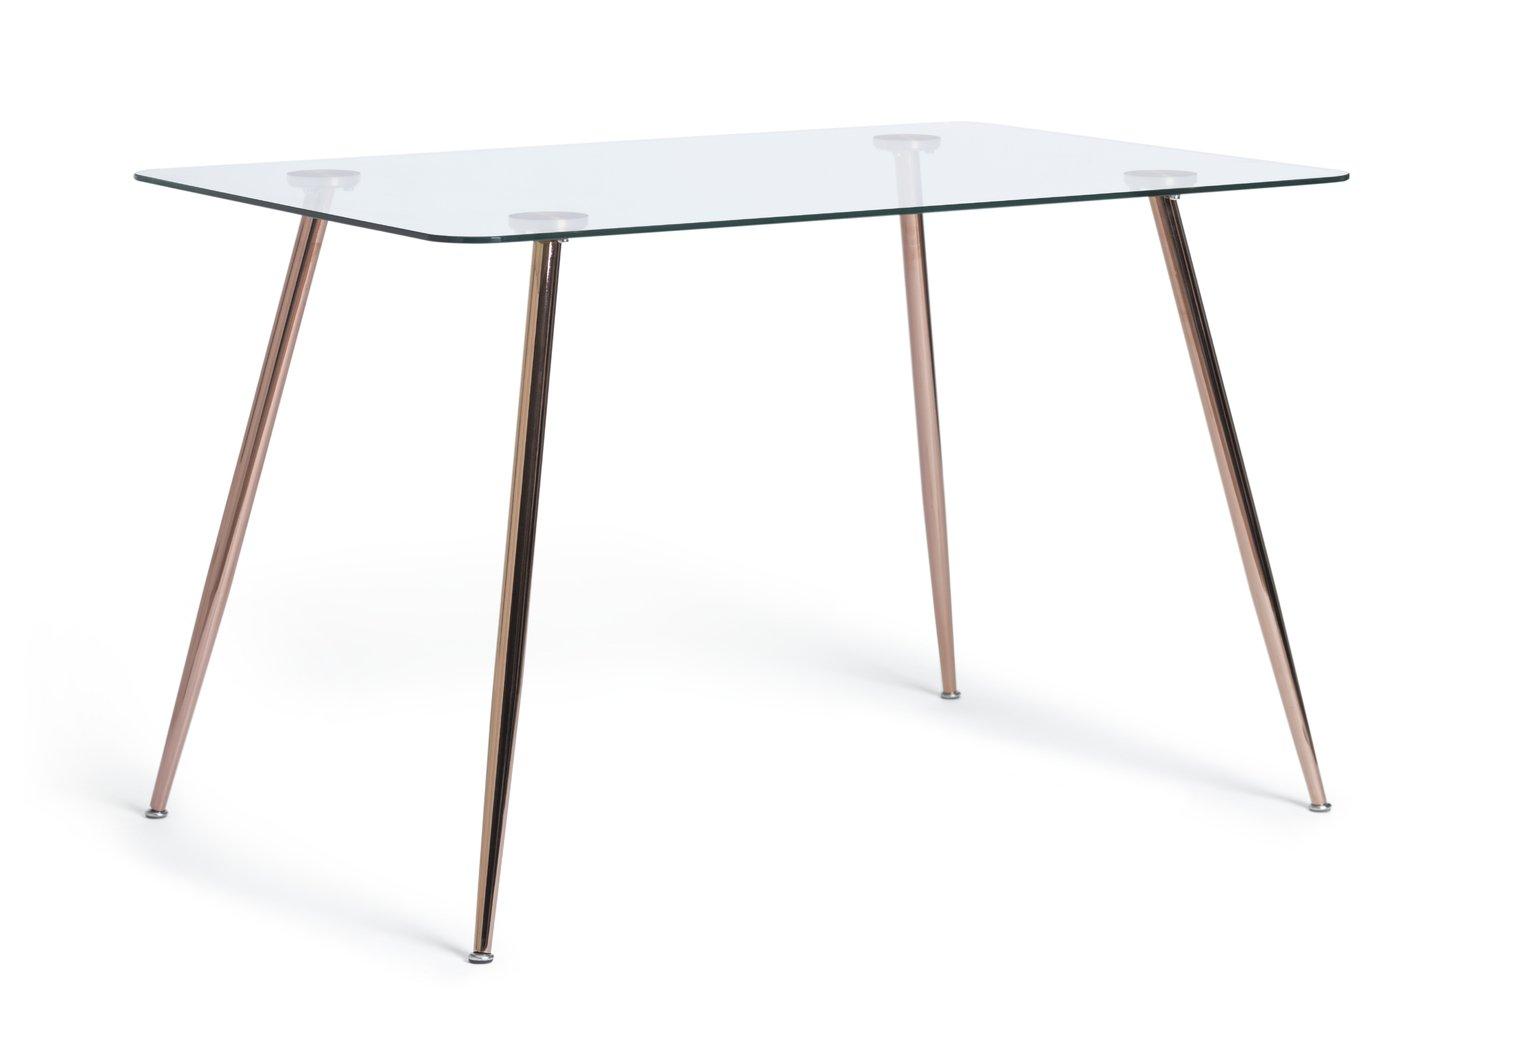 Habitat Beni Glass 6 Seater Dining Table - Rose Gold